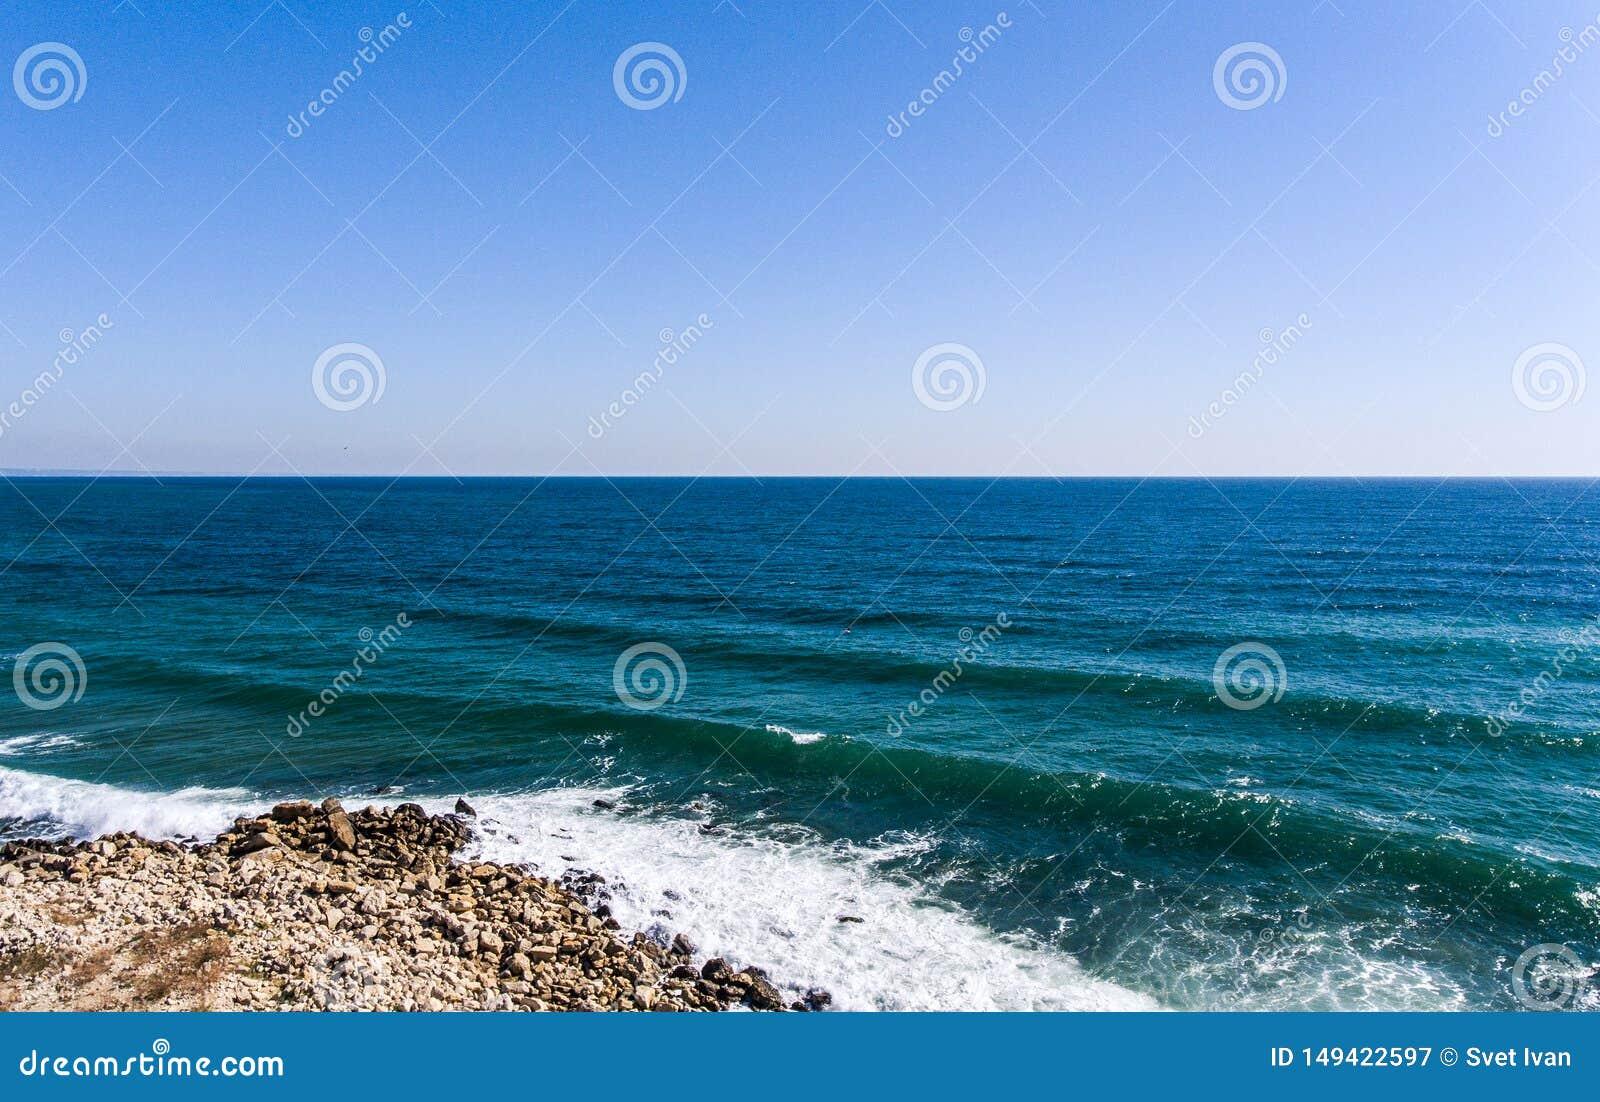 Het overzeese strandhommel van Bulgary birdseye